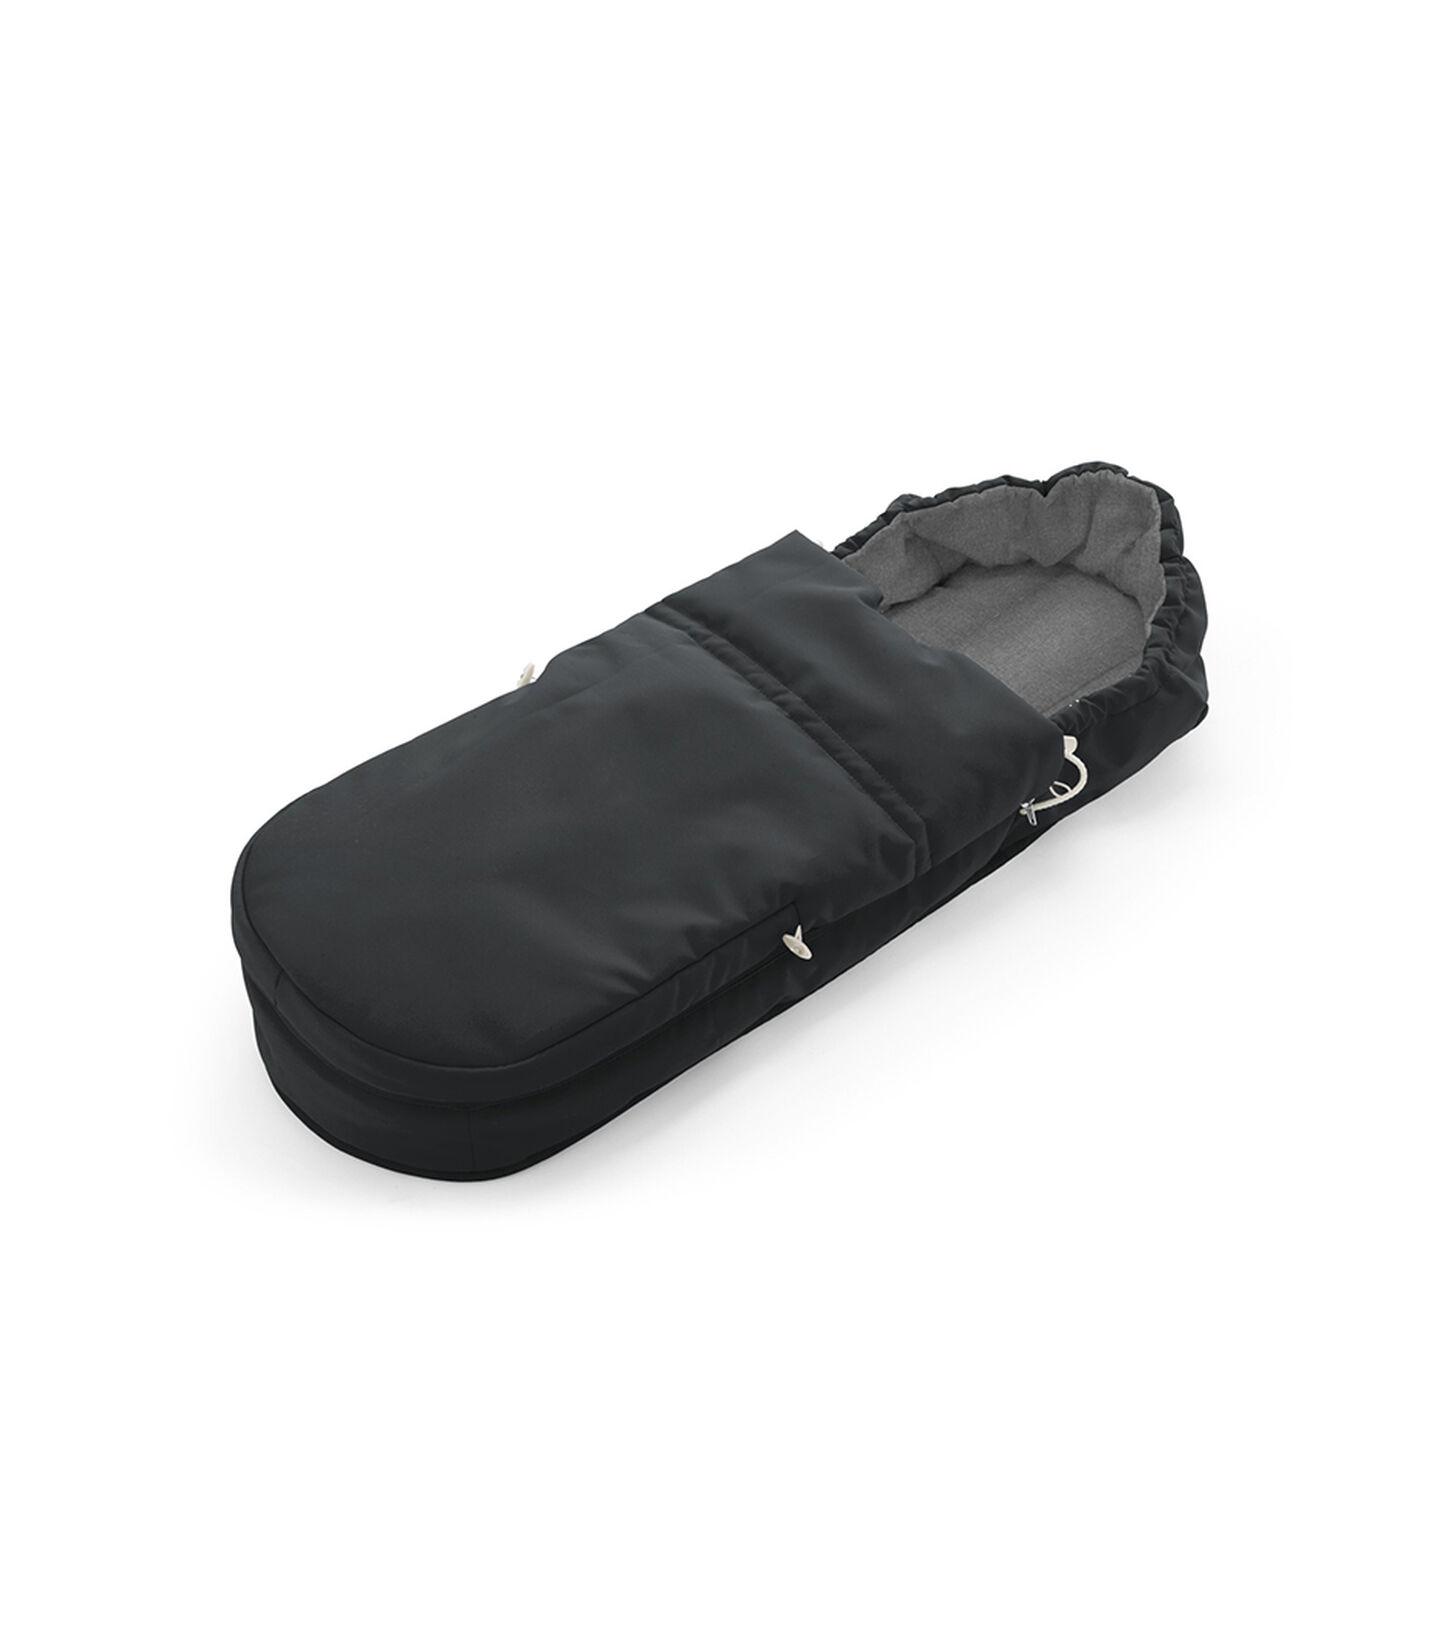 Accessories. Soft Bag, Black.